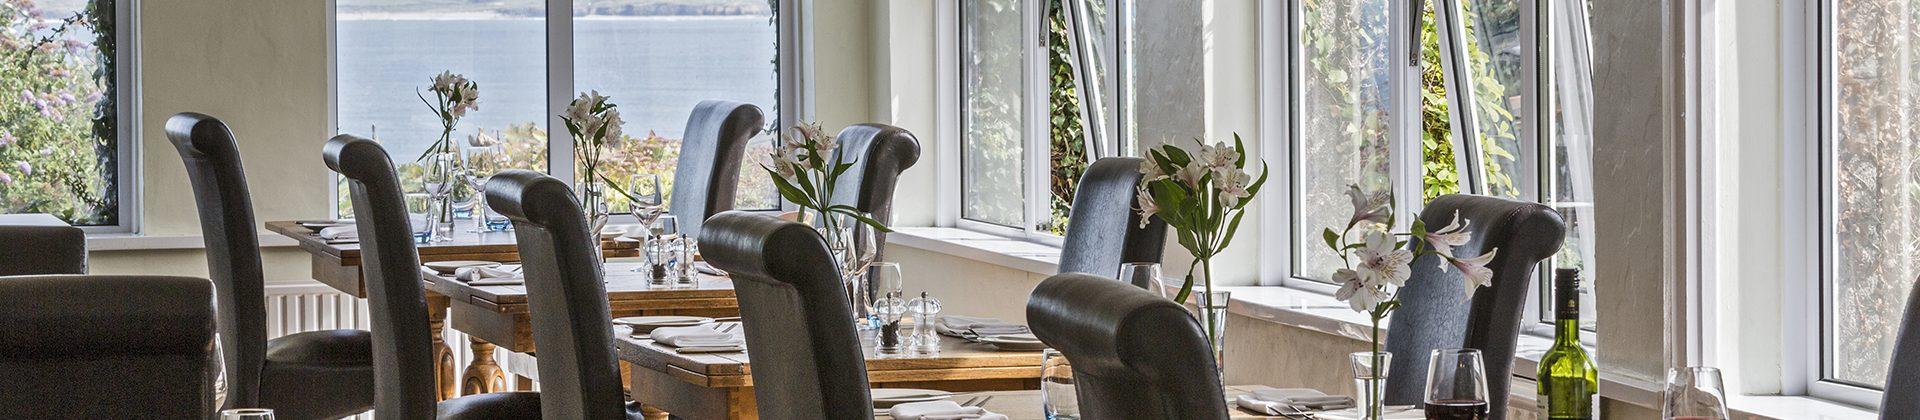 The Garrack Hotel - Restaurant